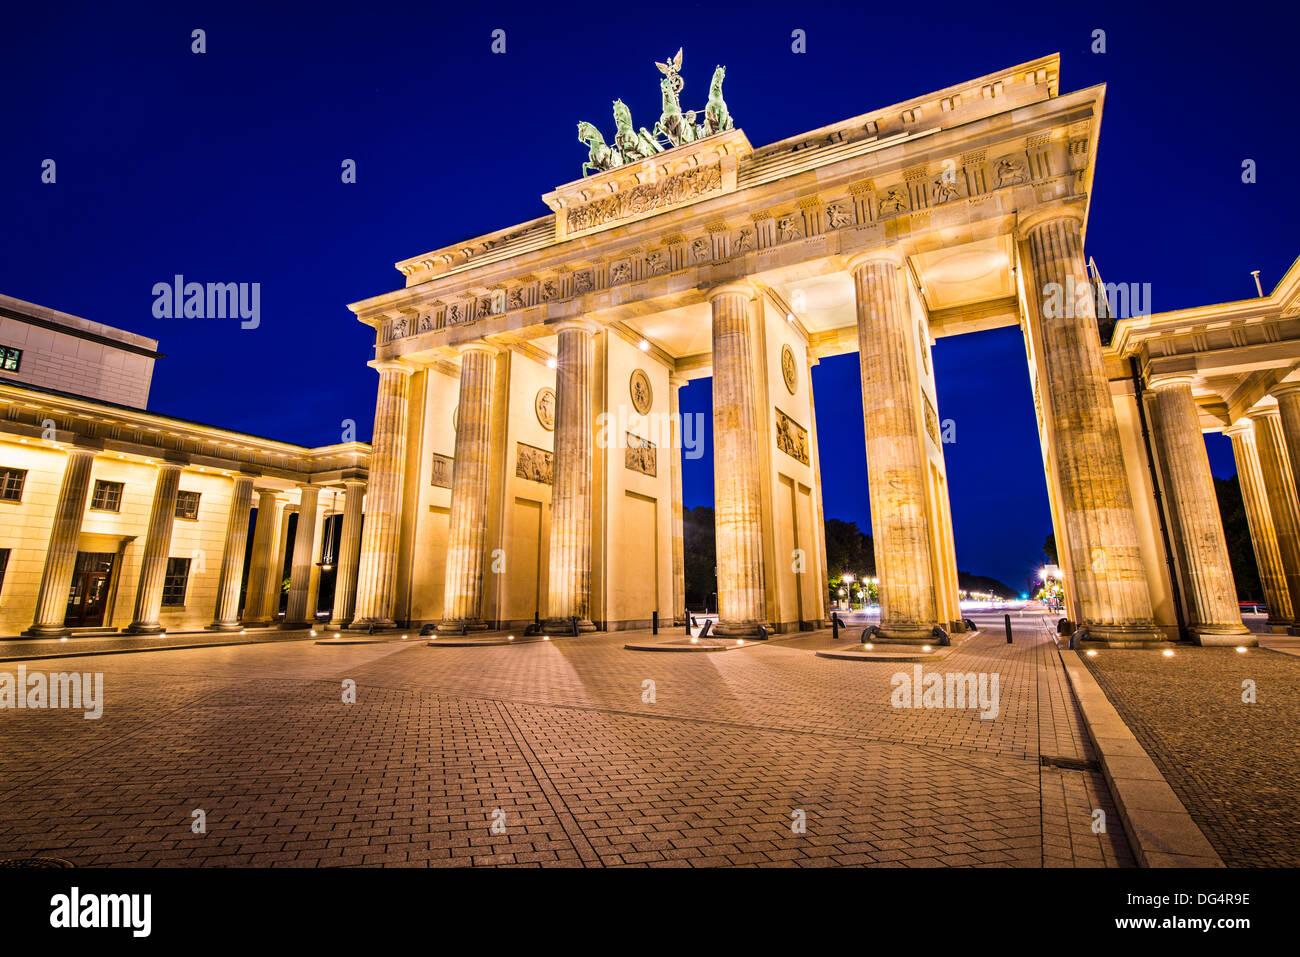 Puerta de Brandenburgo en Berlín, Alemania. Imagen De Stock